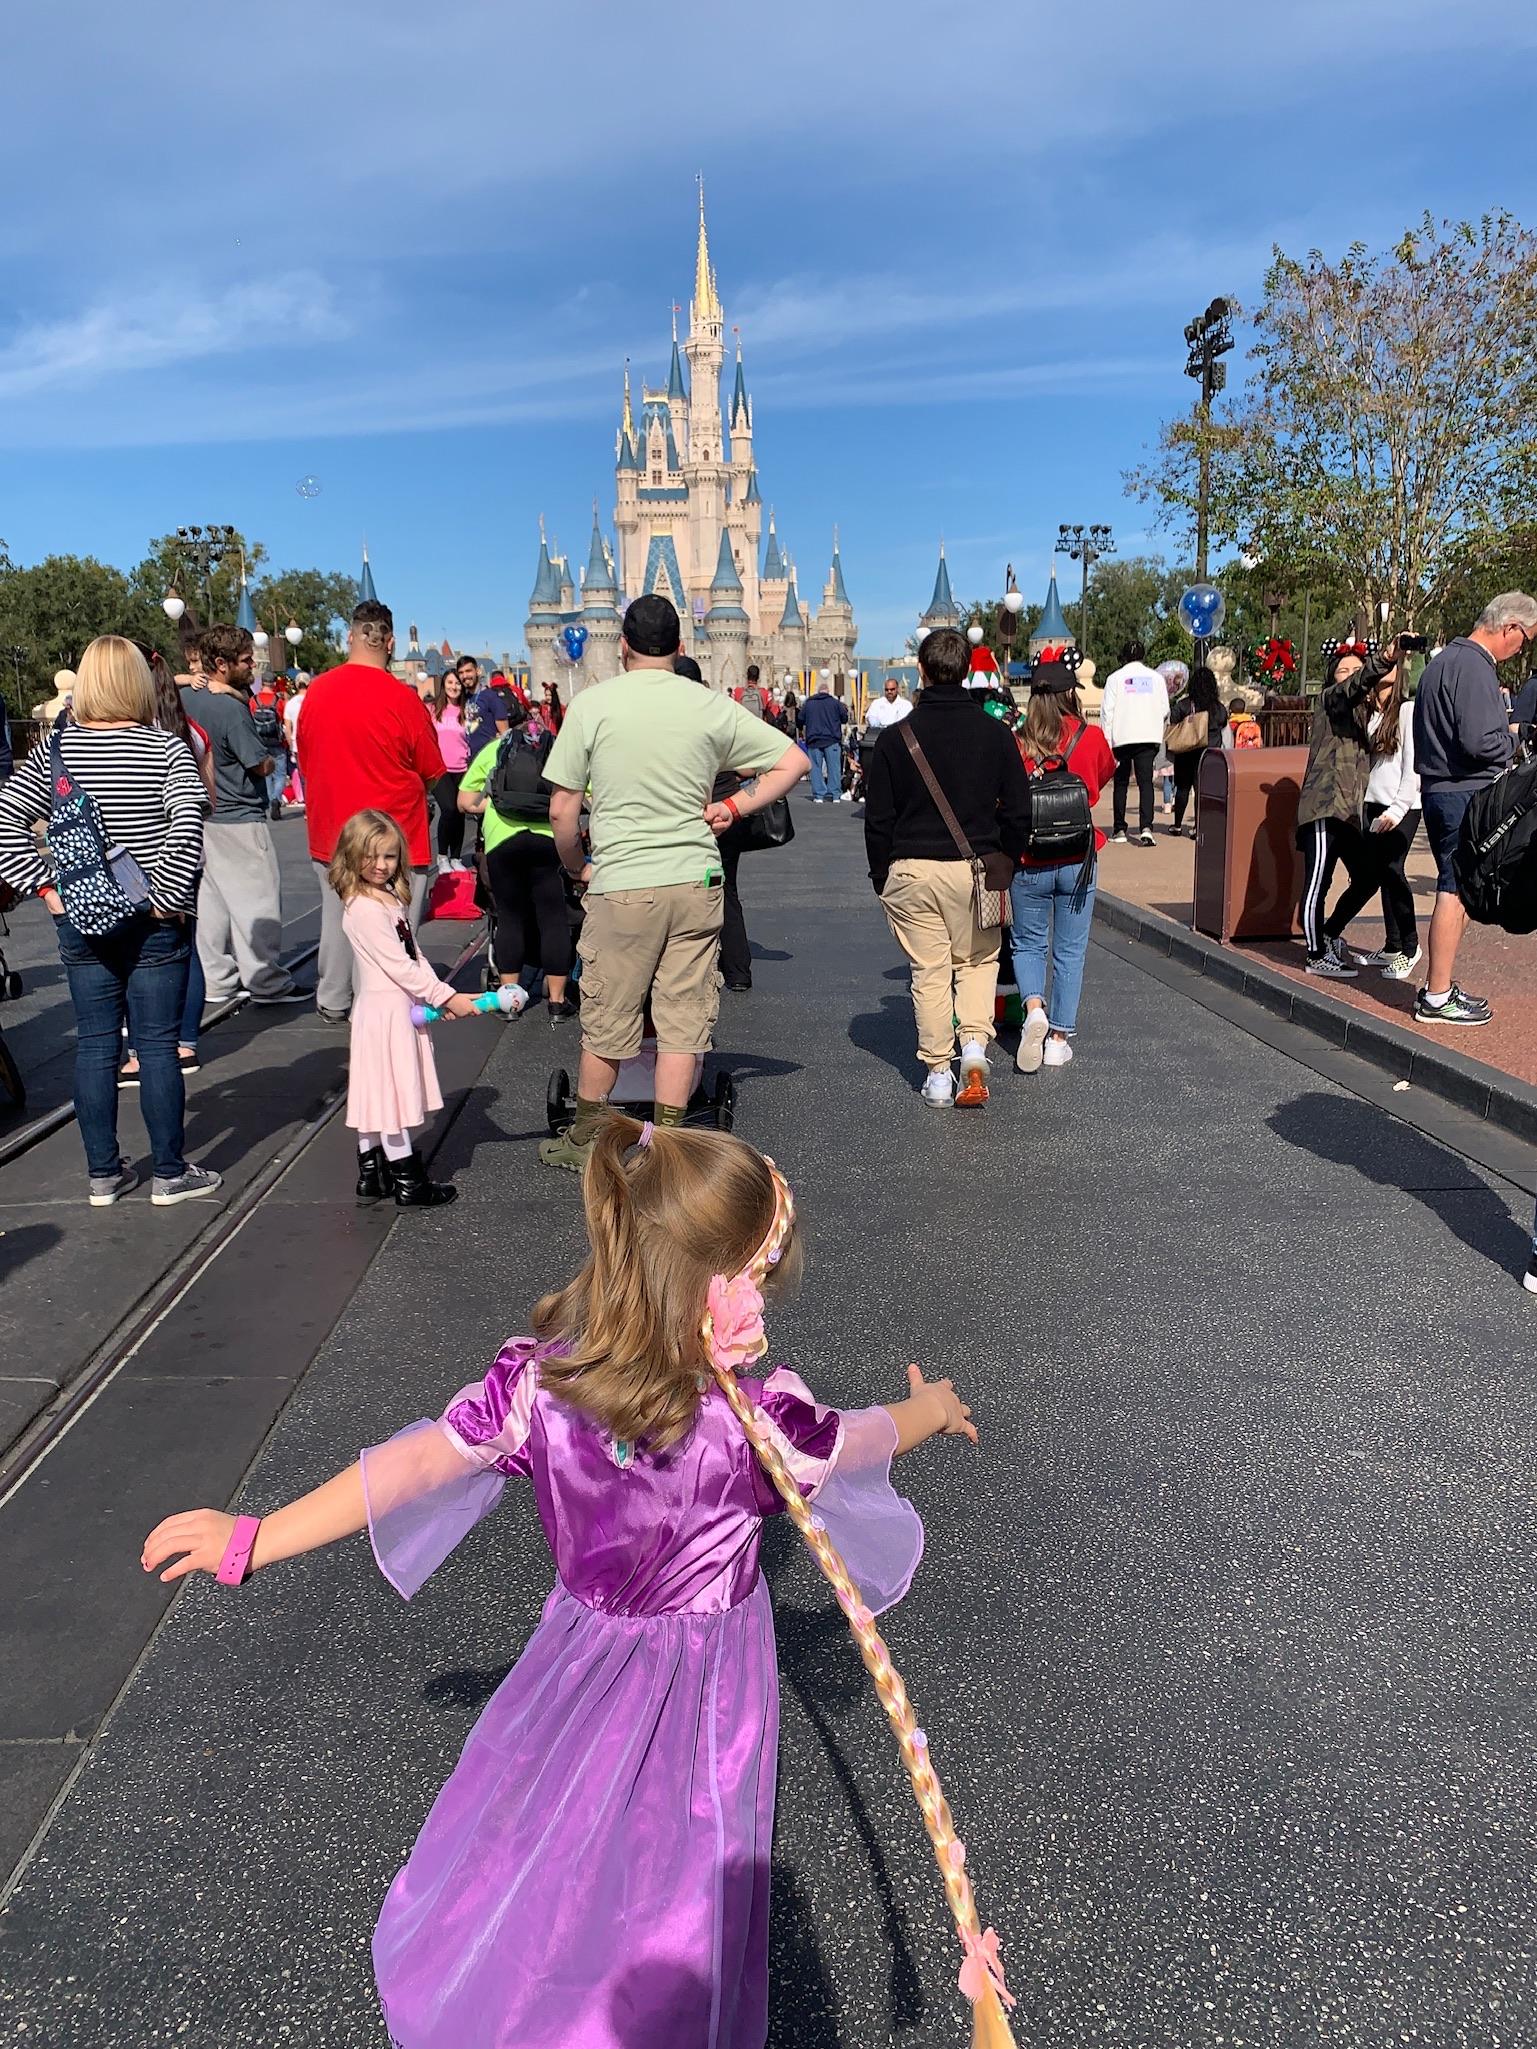 Soaking in that Disney Magic